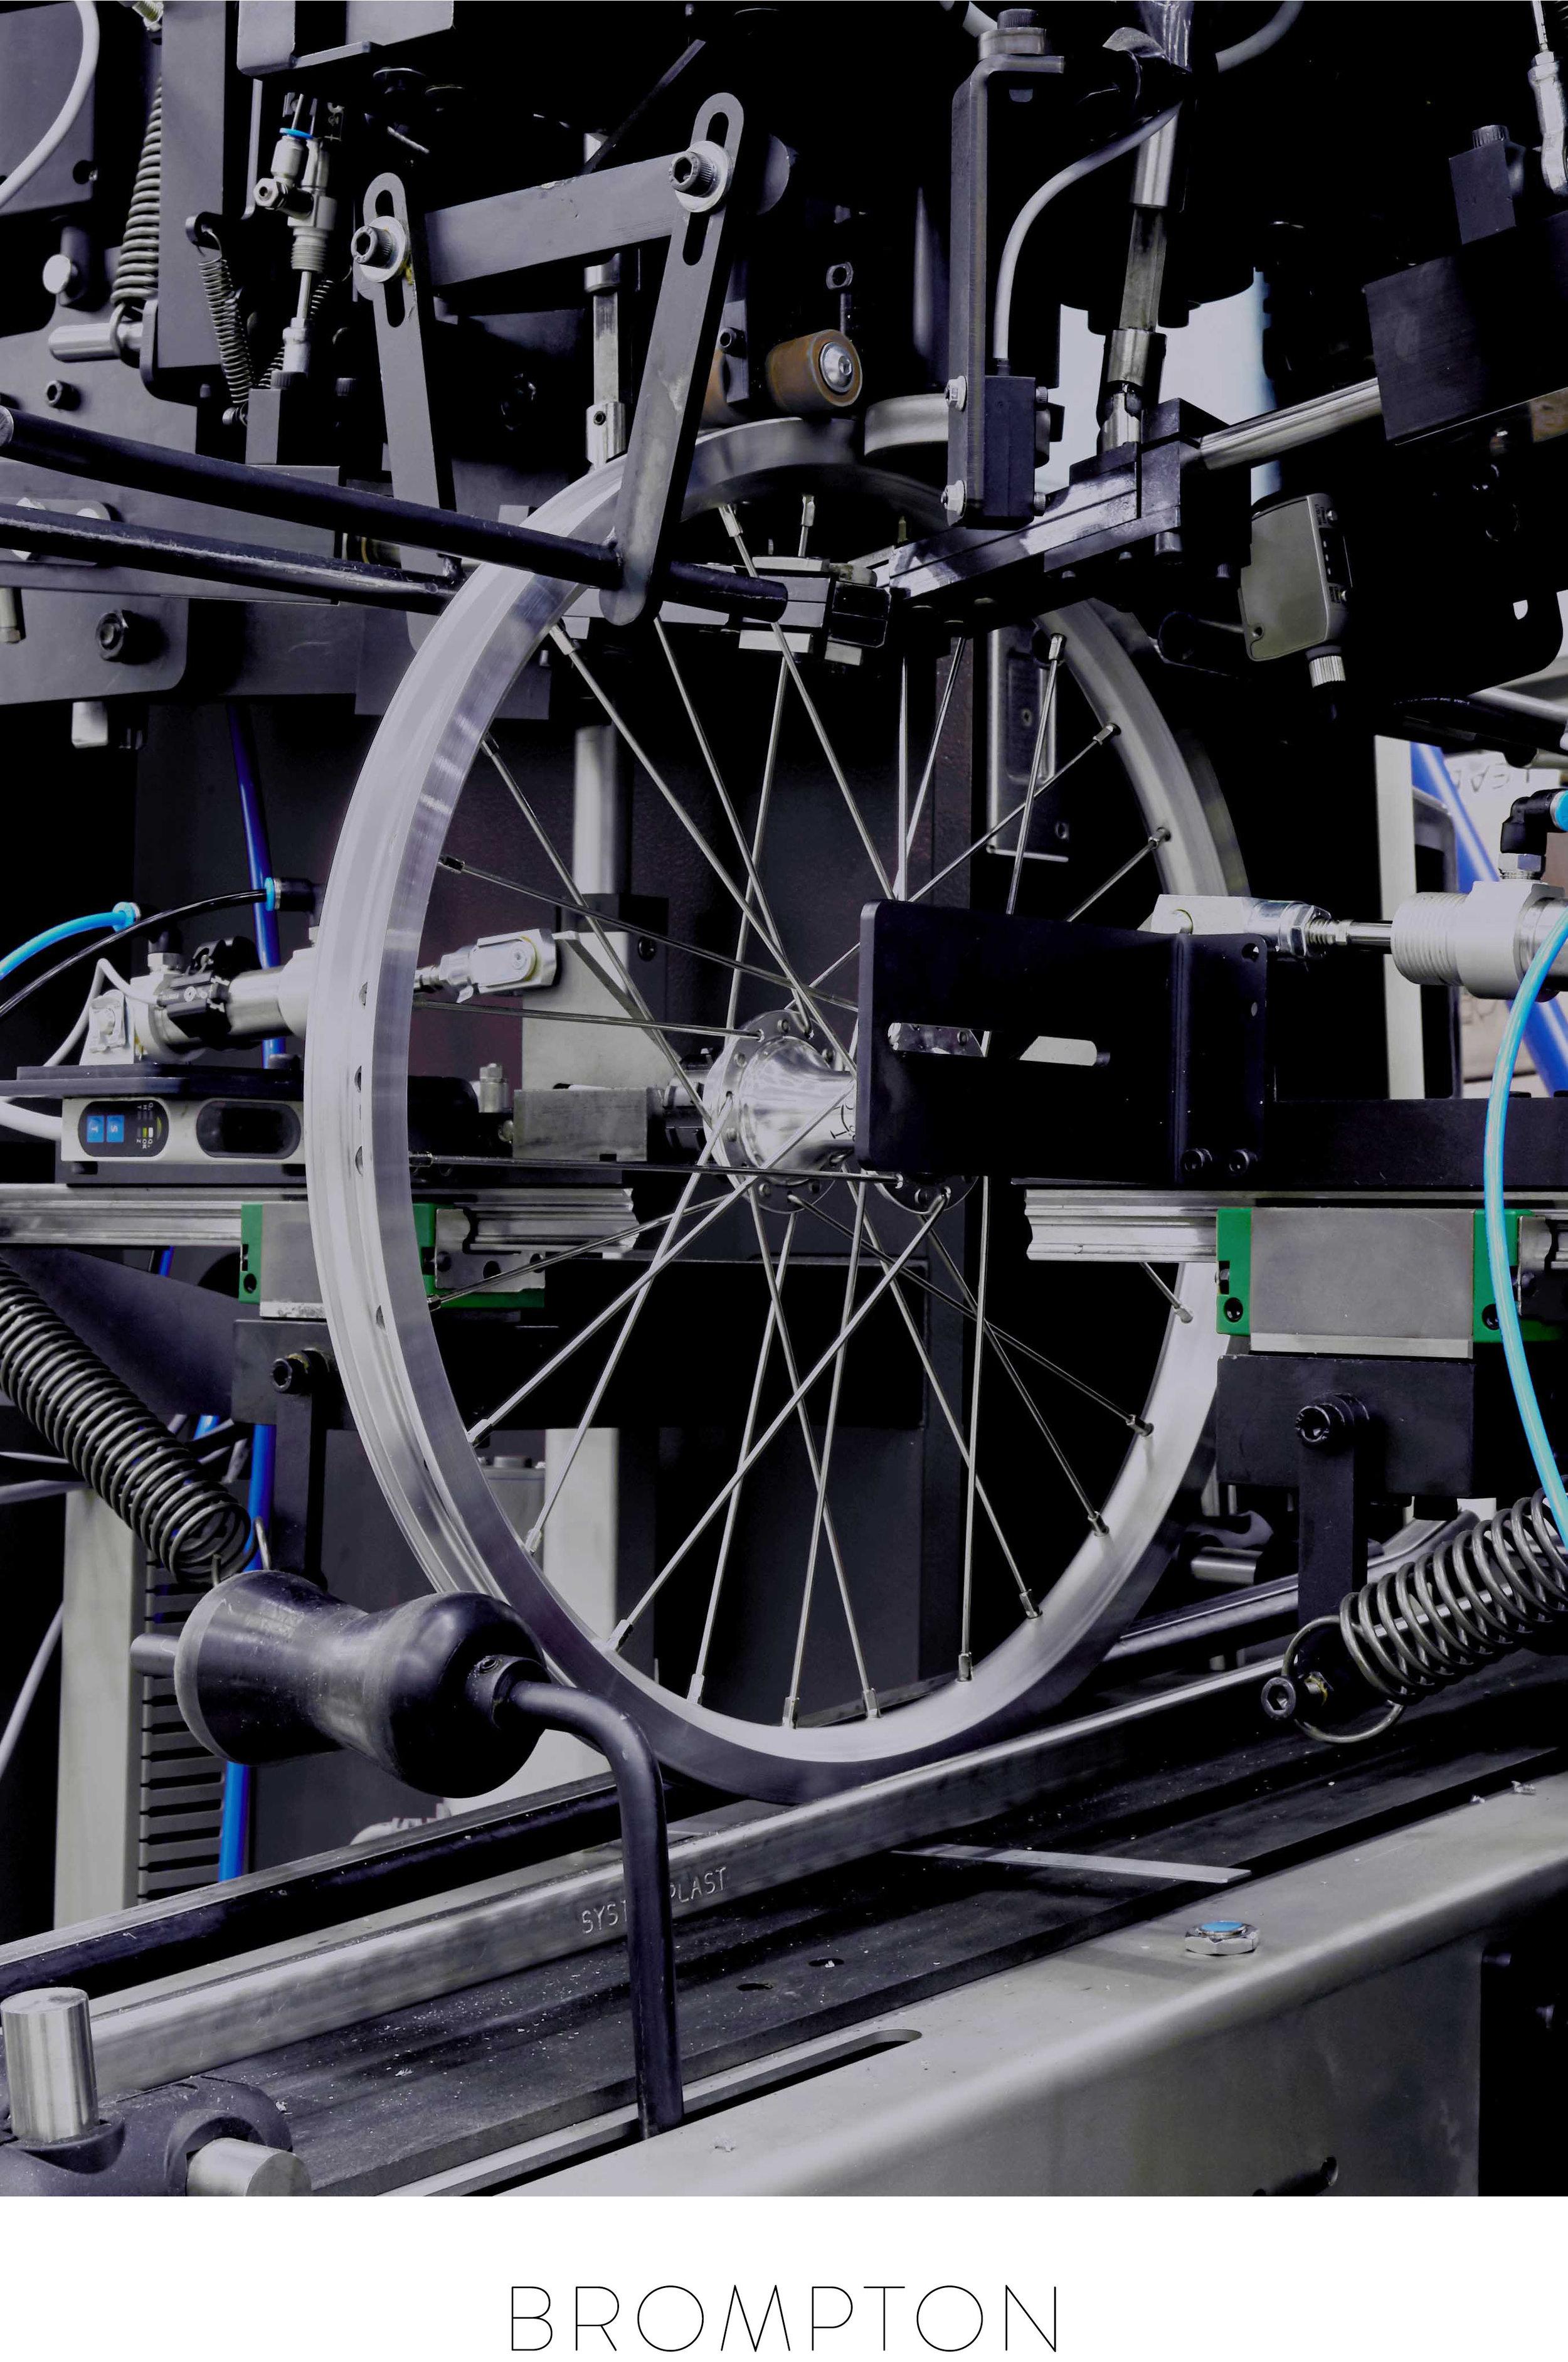 Brompton_Bikes_302_Test copy.jpg